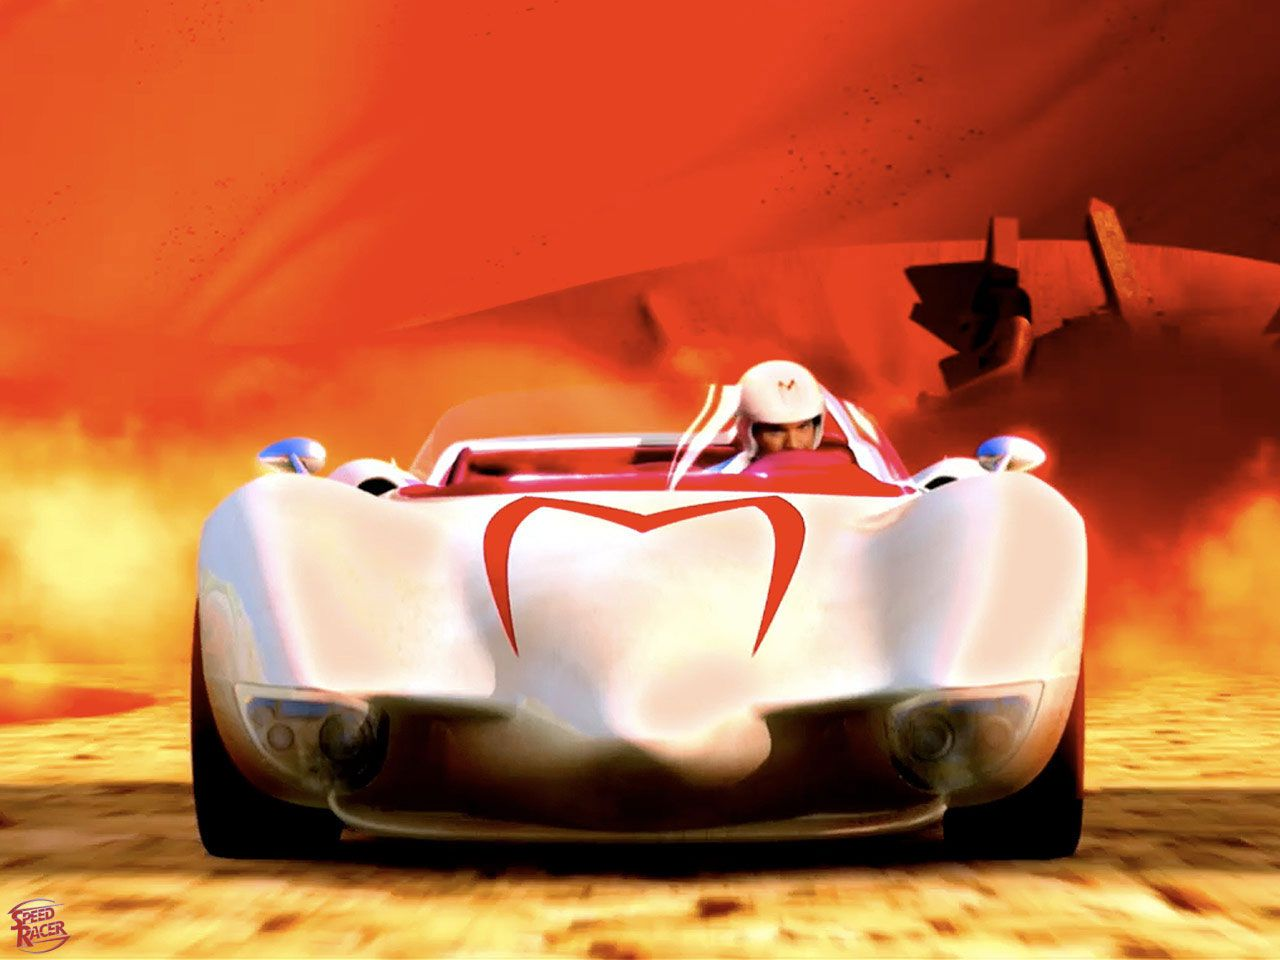 speed racer car 2 Speed racer, Speed racer car, Speed